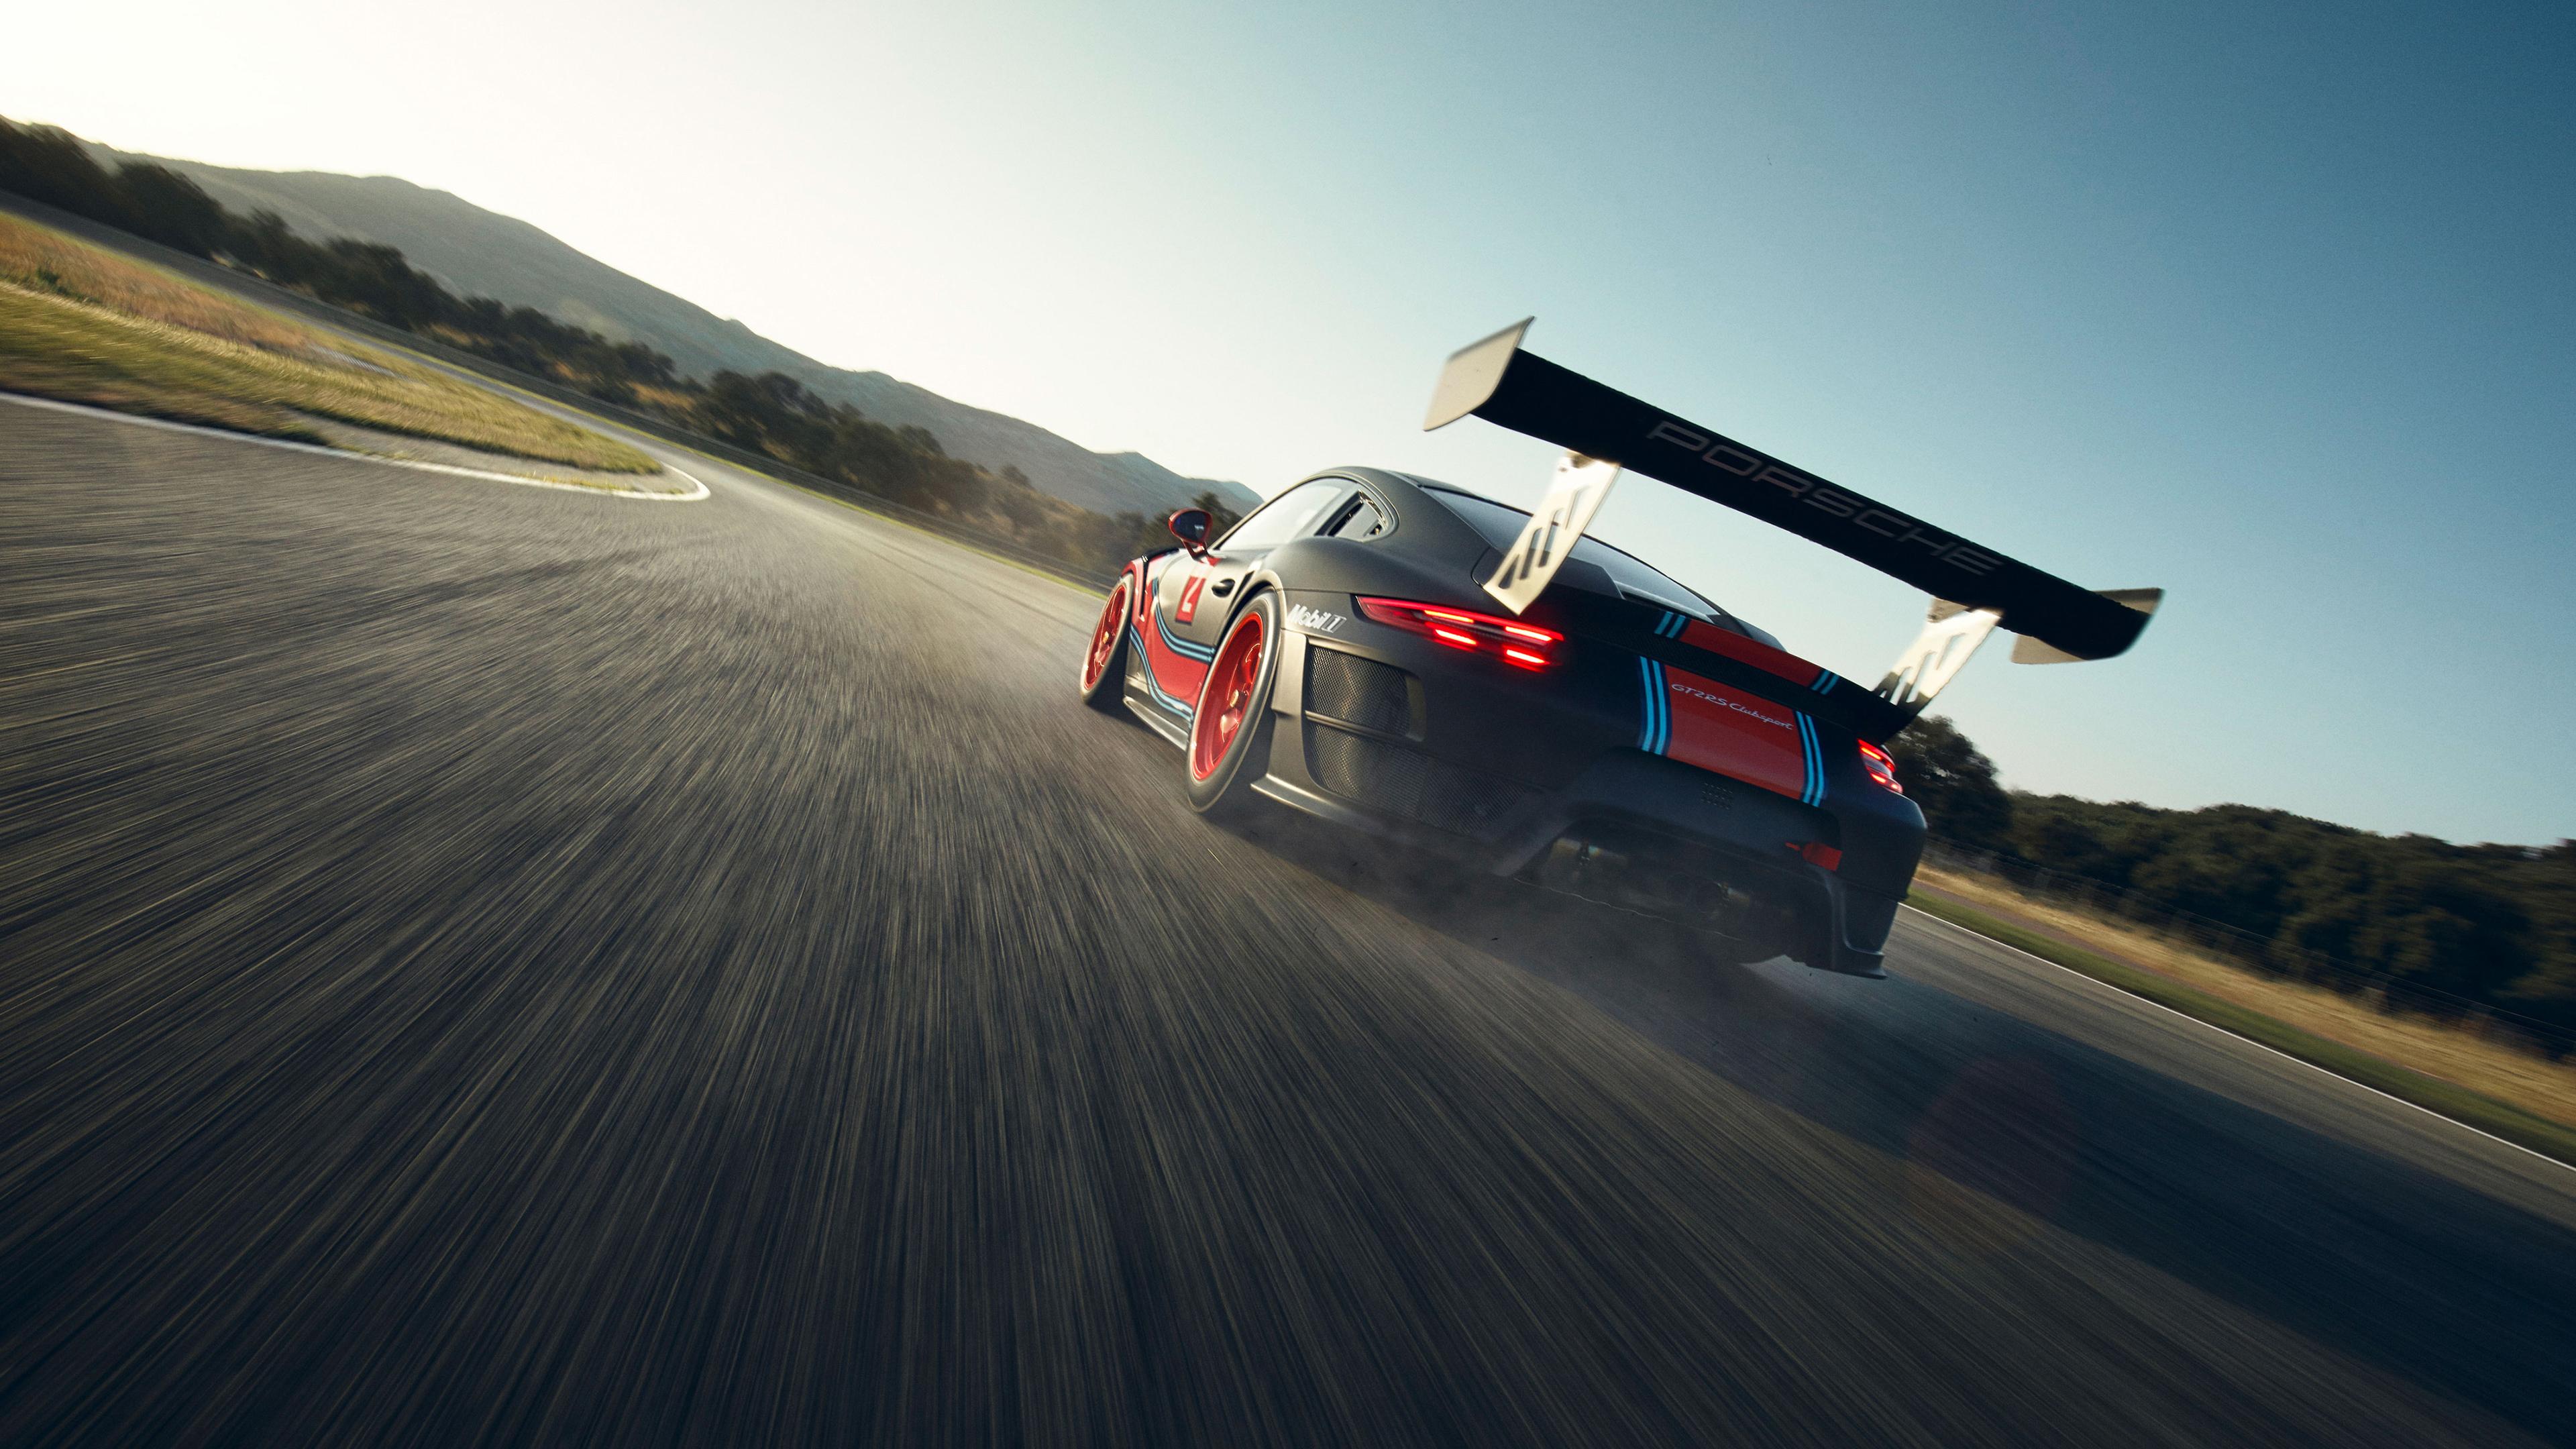 porsche 911 gt2 rs 2019 4k 1546362088 - Porsche 911 GT2 RS 2019 4k - porsche wallpapers, porsche 911 wallpapers, hd-wallpapers, cars wallpapers, 4k-wallpapers, 2019 cars wallpapers